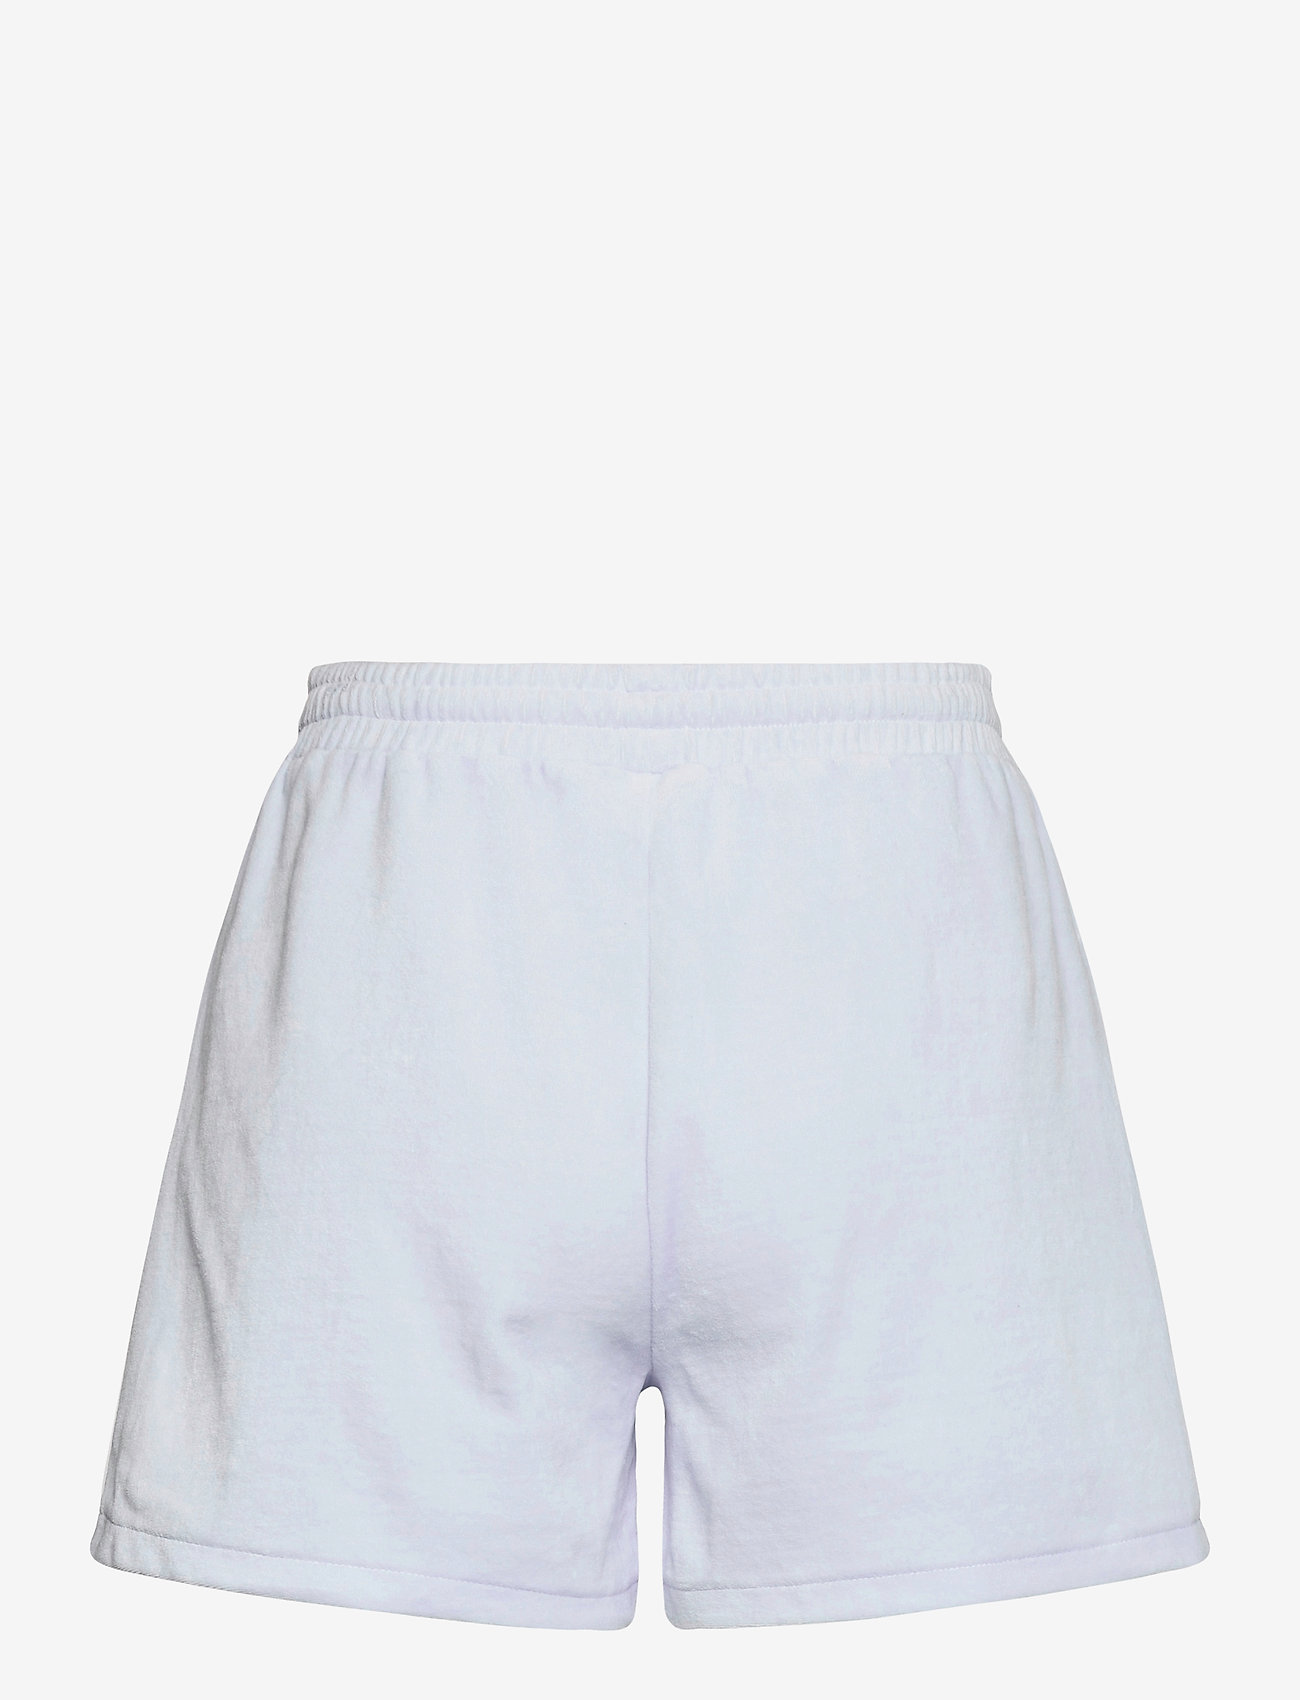 Rosemunde - Shorts - casual shorts - heather sky - 1